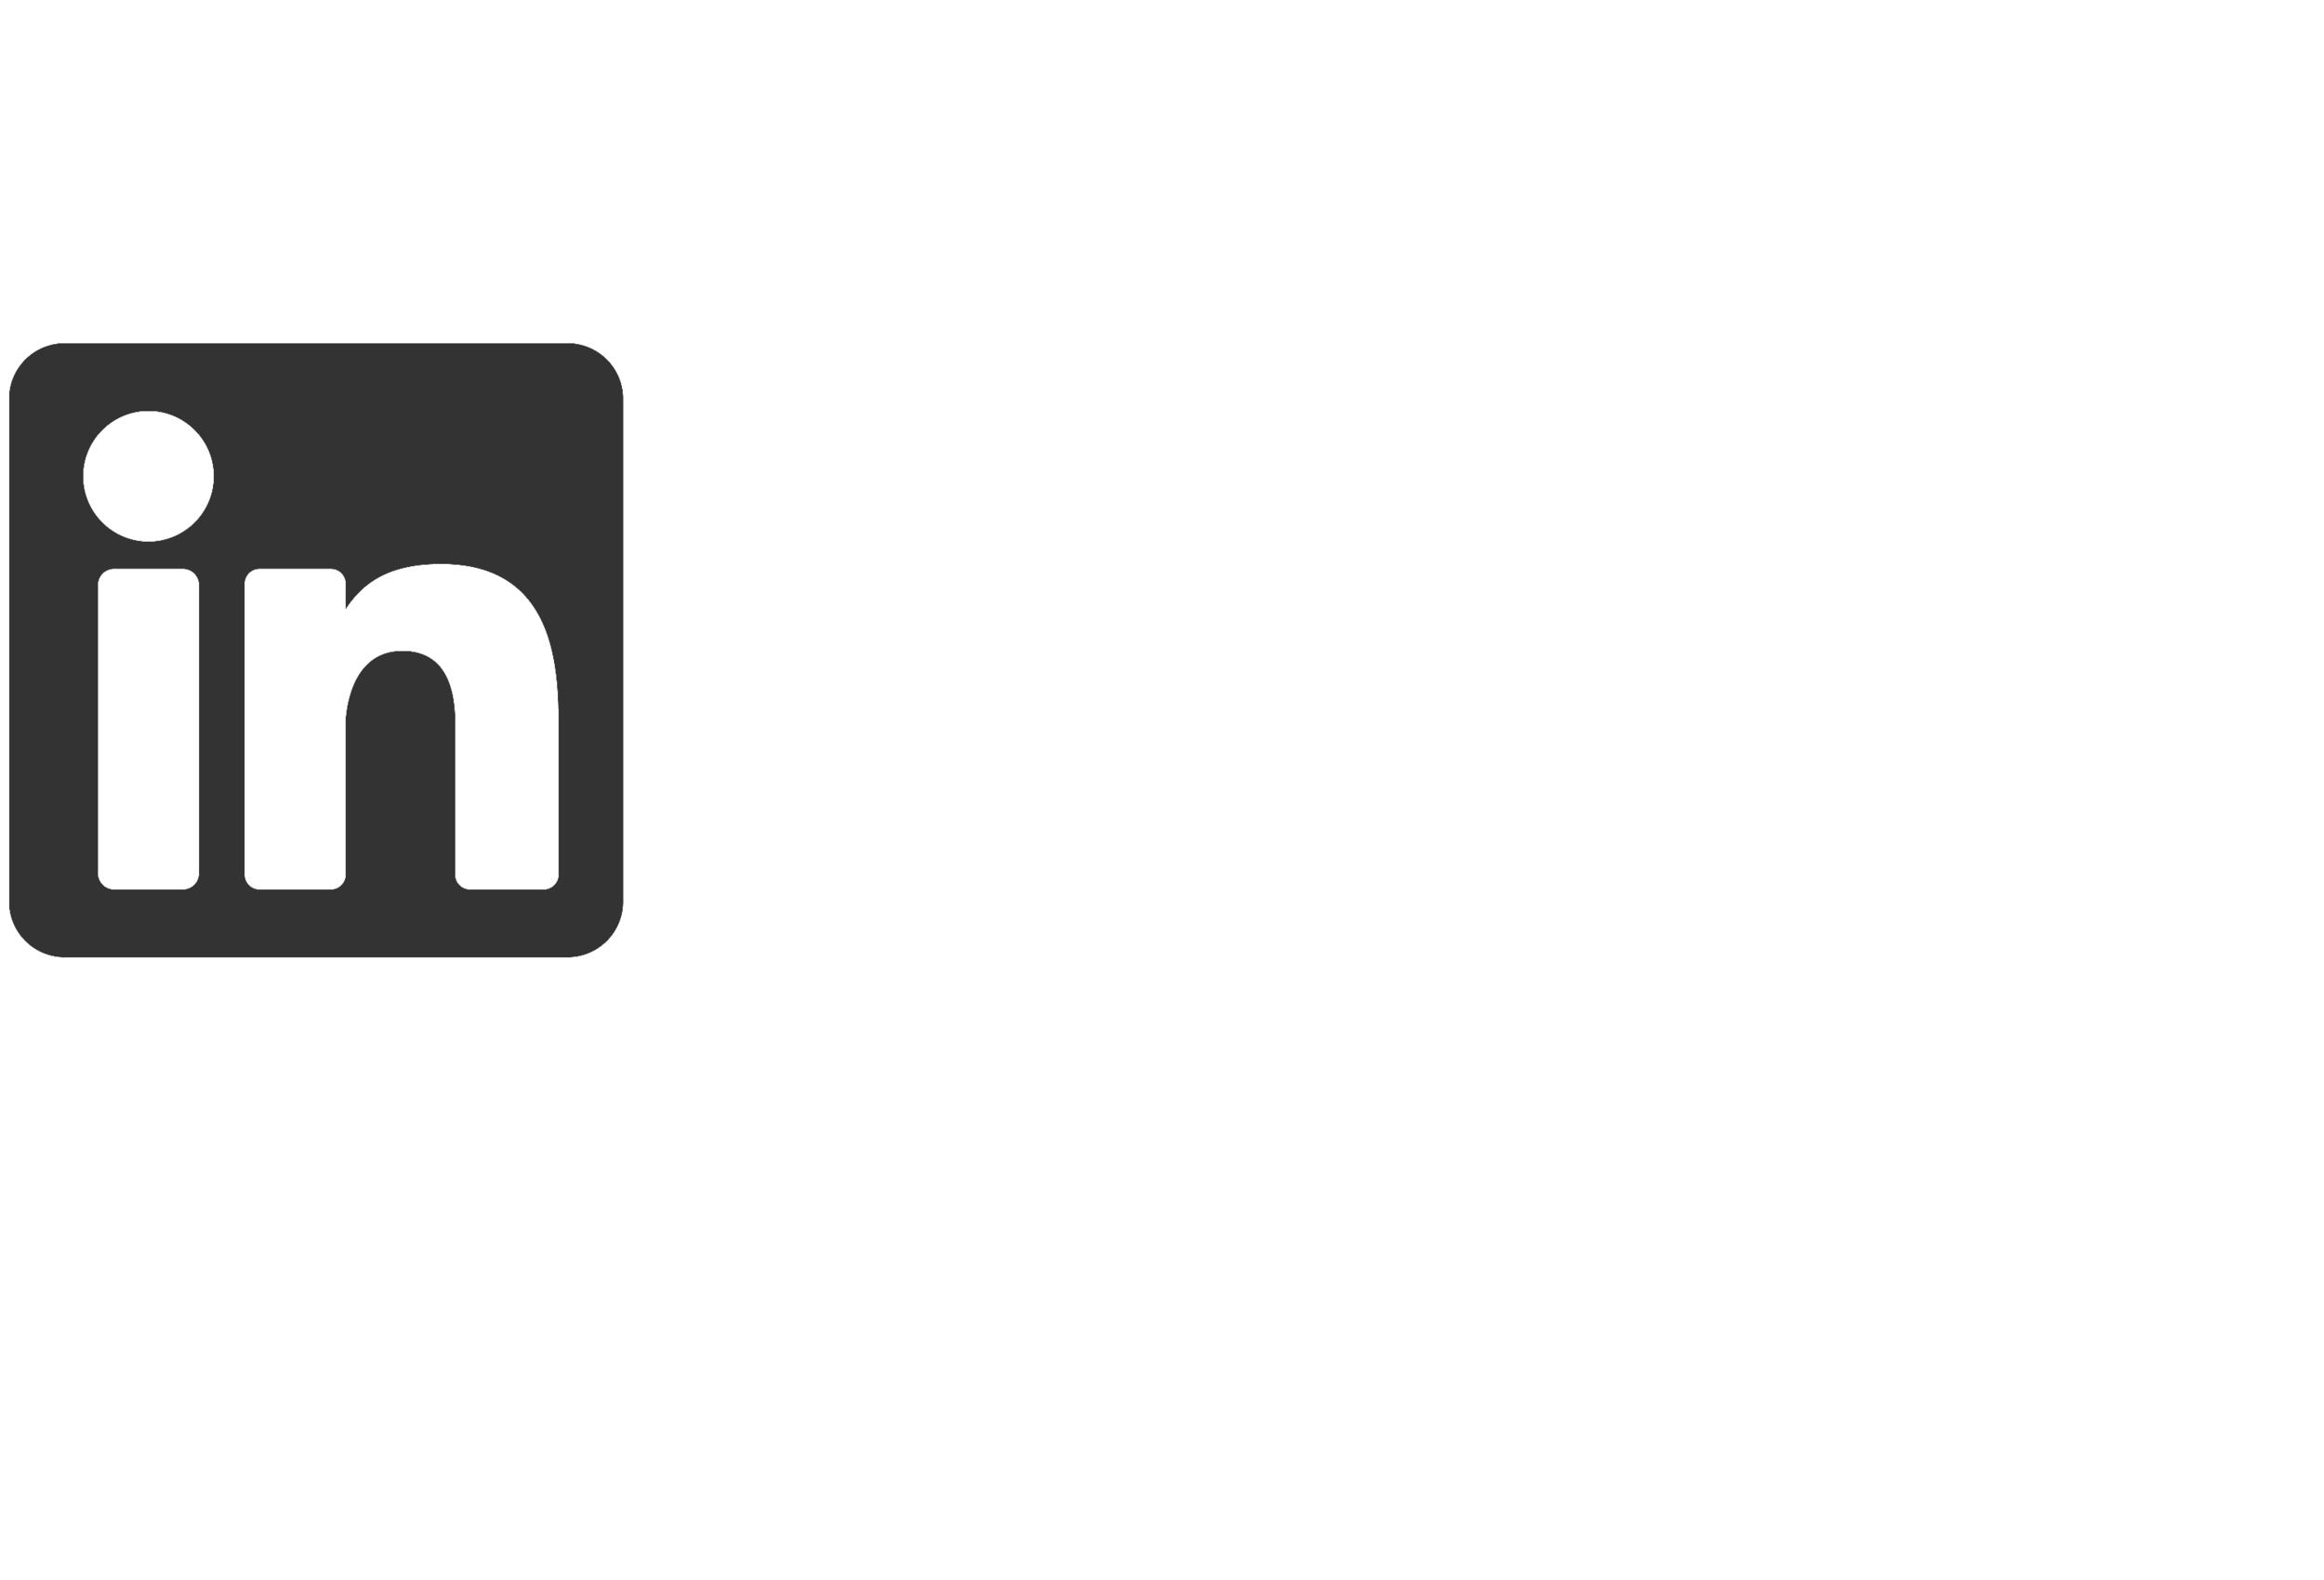 LinkedIn_Charcoal_Left.png